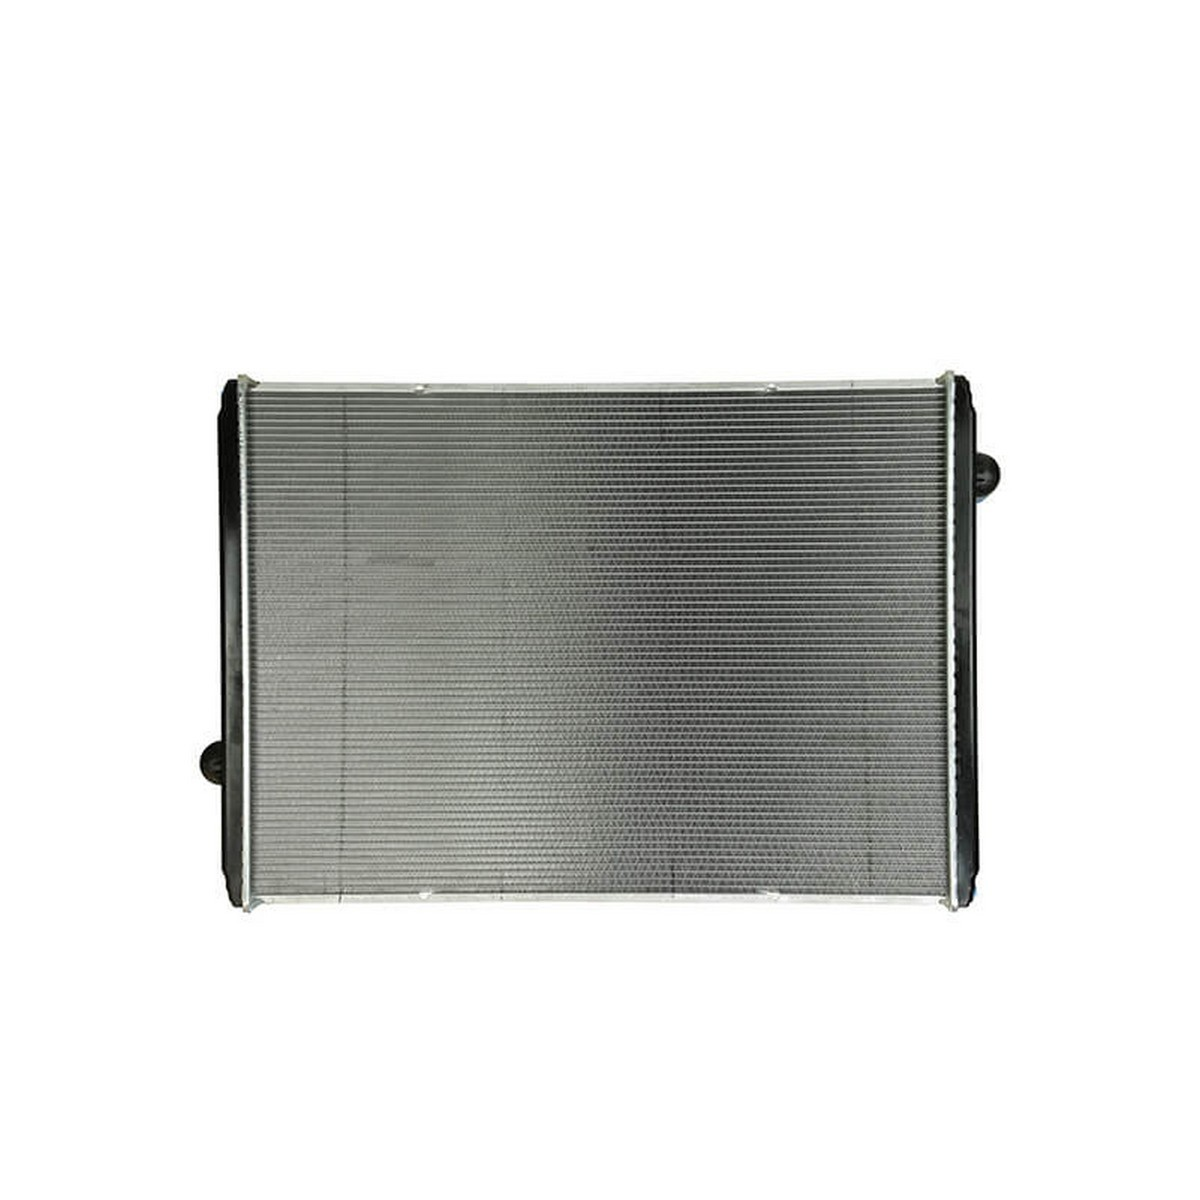 ford sterling lt 9500 at 9500 series 98 99 radiator oem vab1030138 7